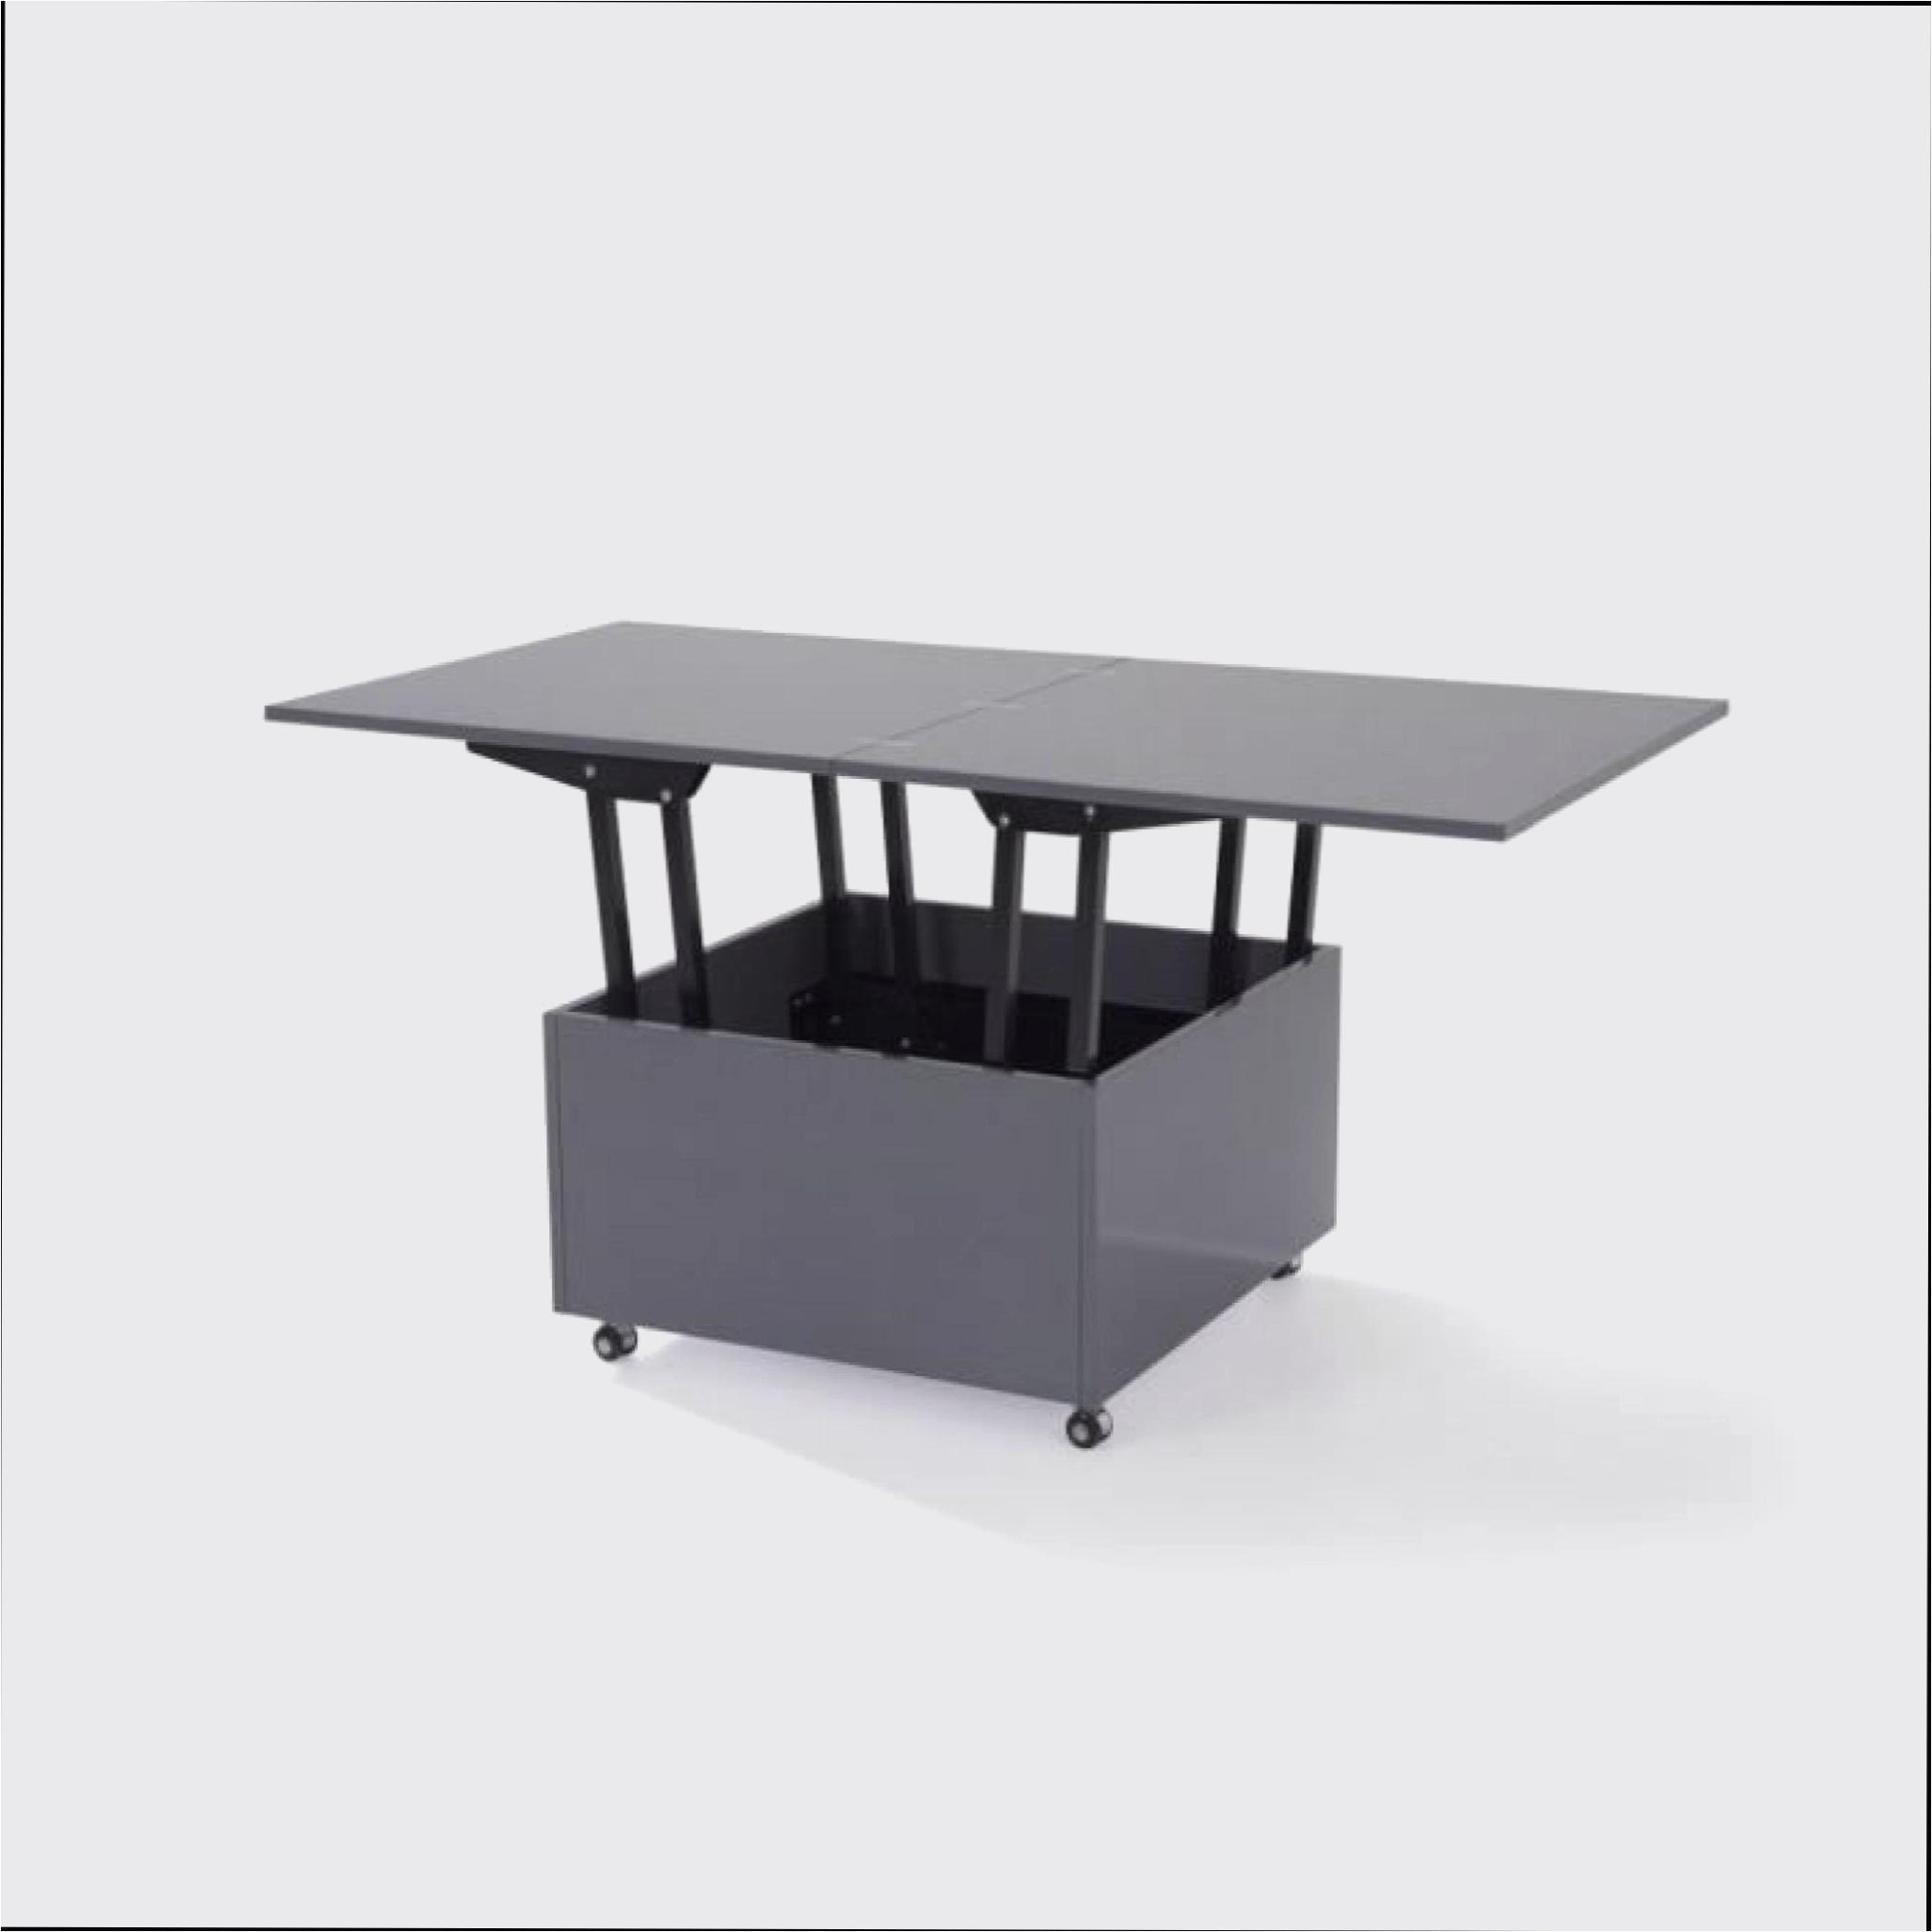 Table Salon Conforama Unique Galerie Table Basse Conforama Verre Beau Frais De Conforama Tables Basses